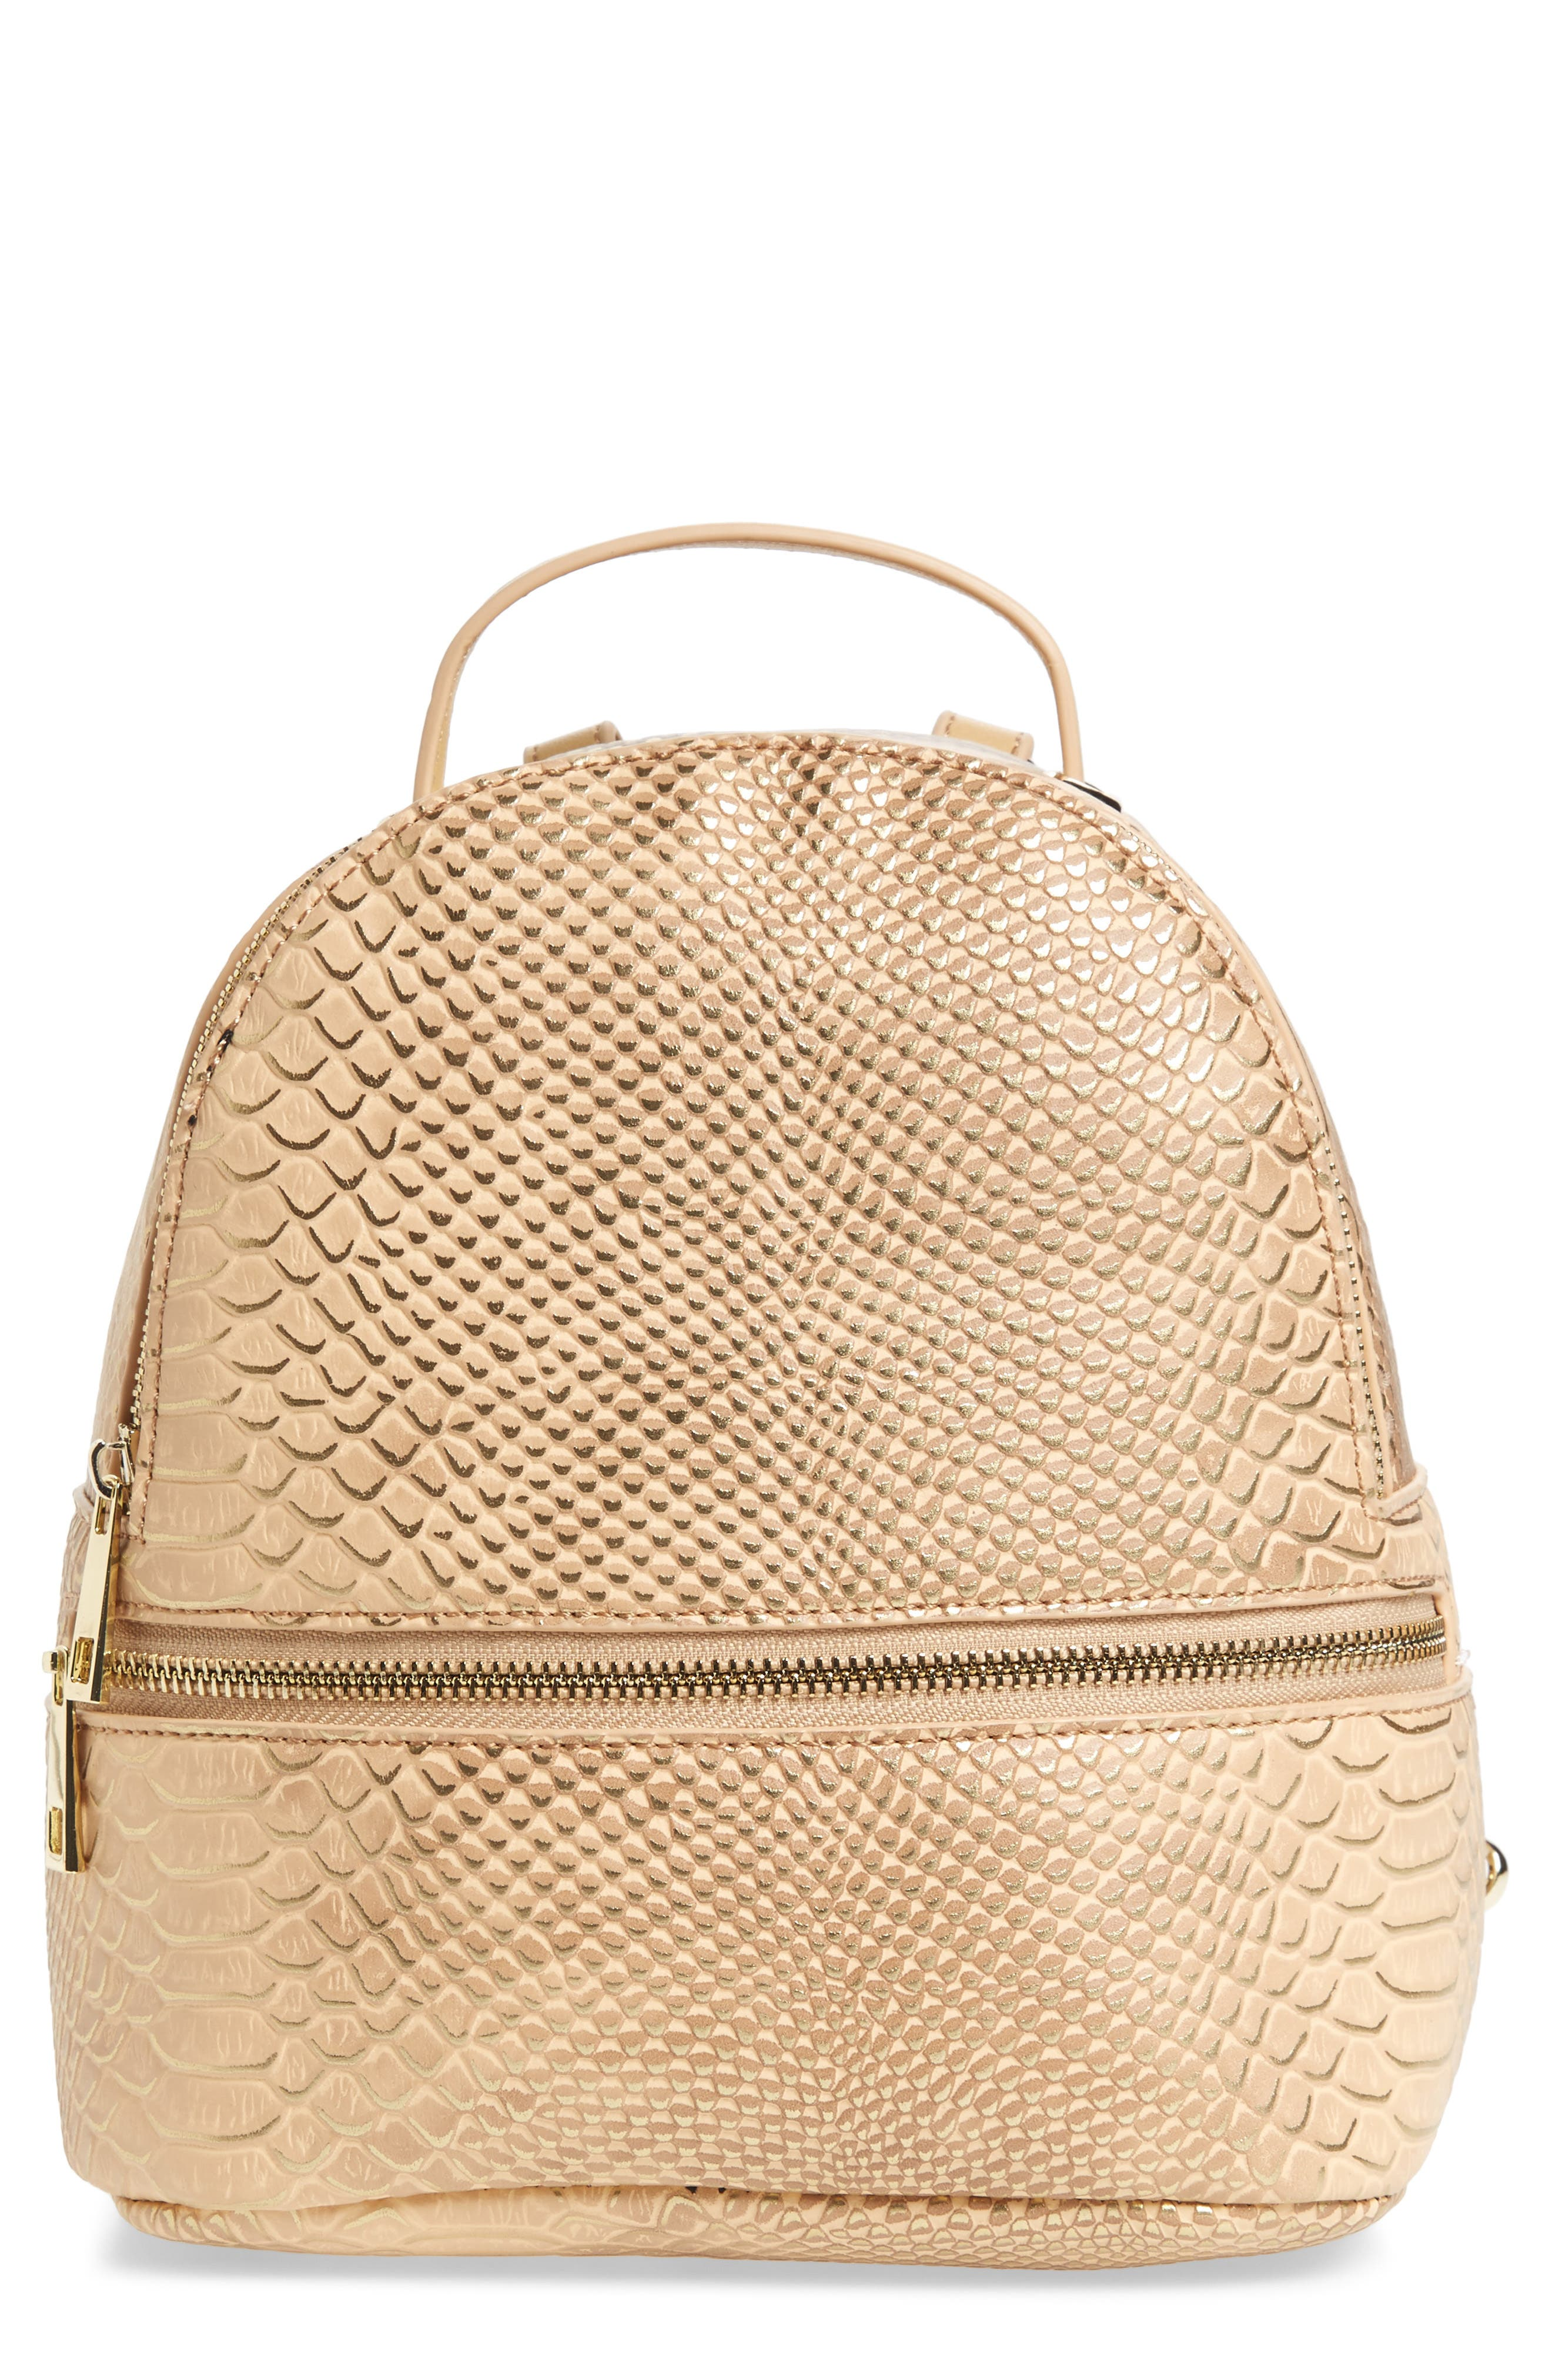 Colette Faux Leather Backpack,                             Main thumbnail 1, color,                             250